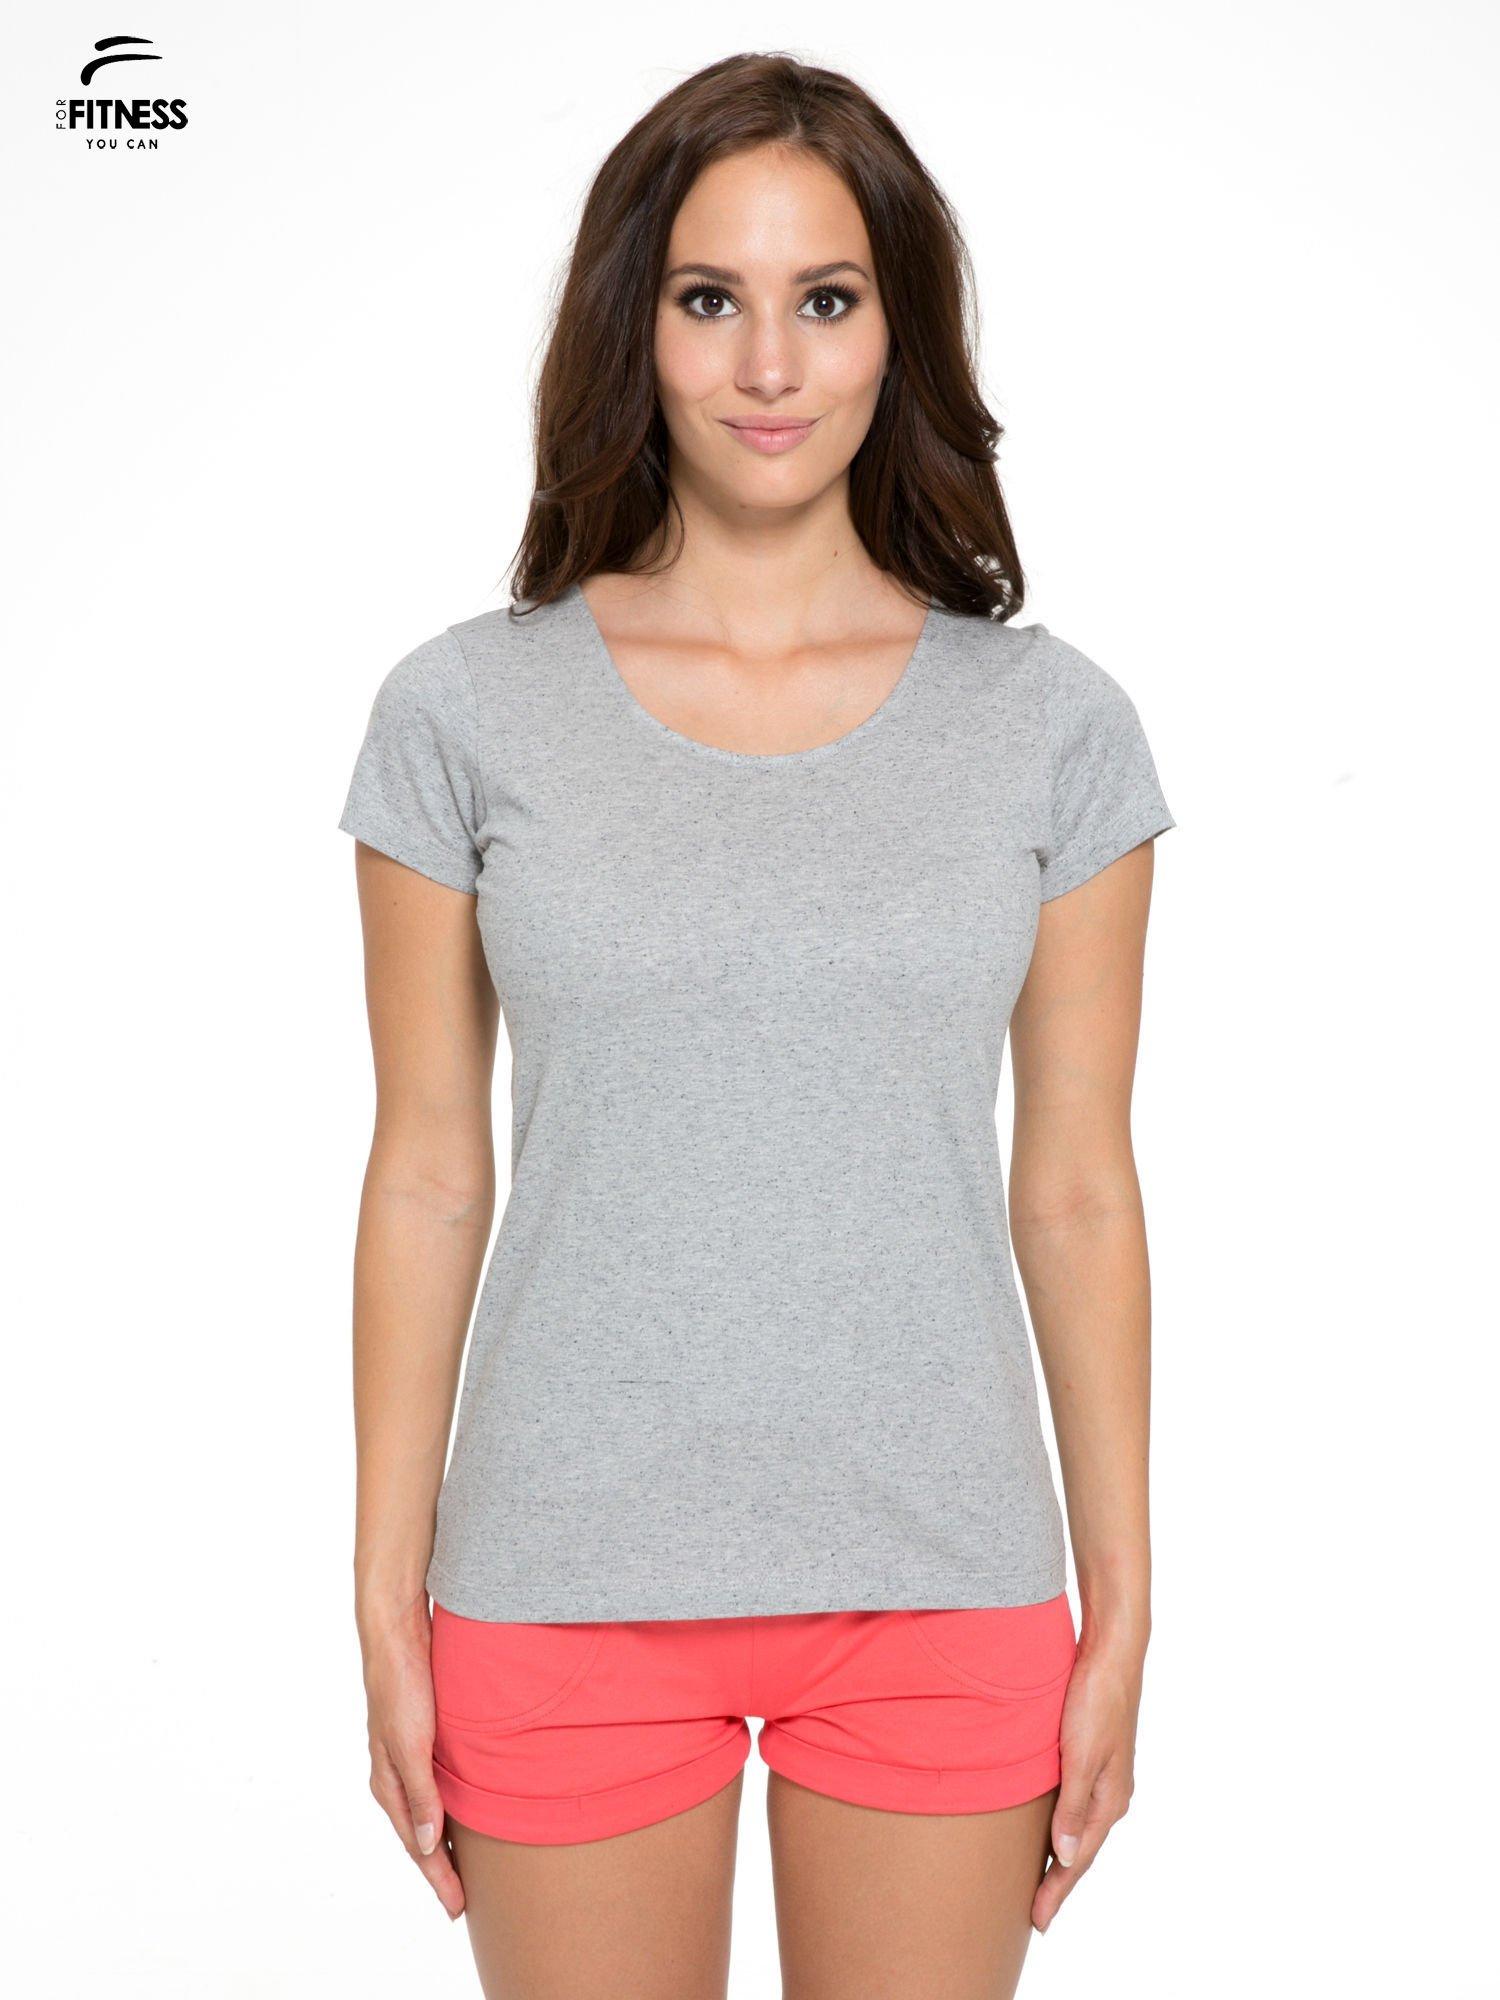 Szary bawełniany t-shirt damski typu basic                                  zdj.                                  1